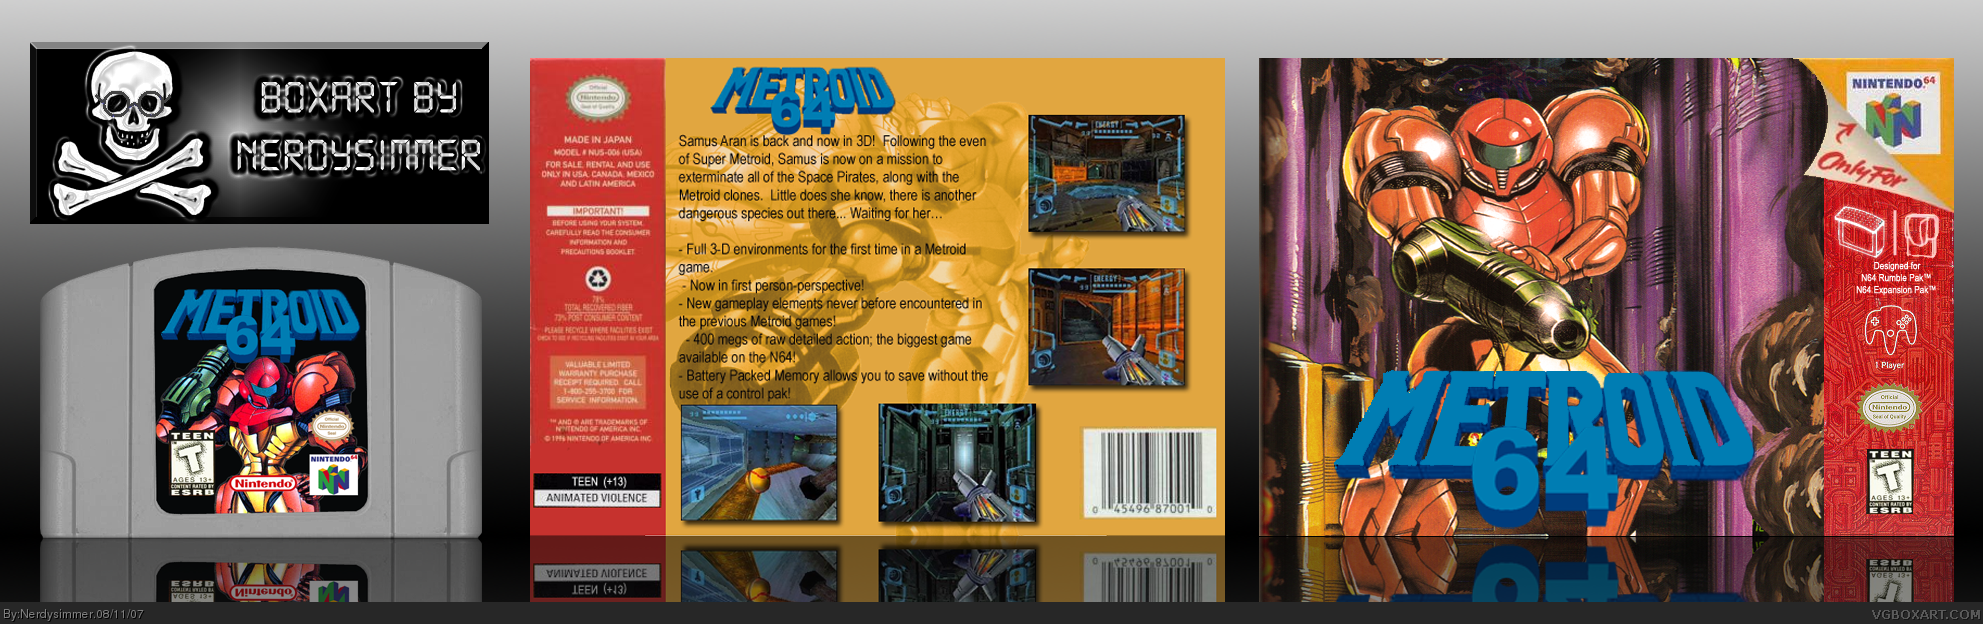 Metroid 64 (unreleased game)